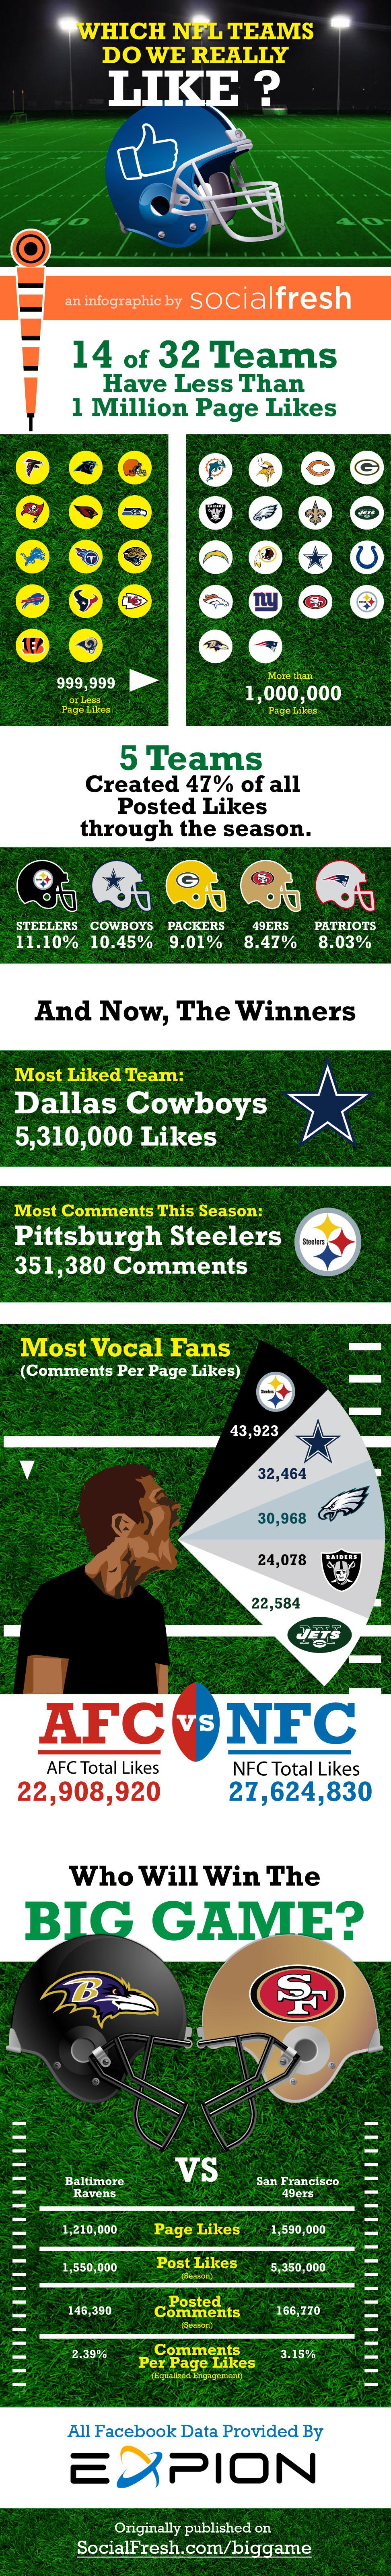 NFL Facebook Likes Infographic via SocialFresh